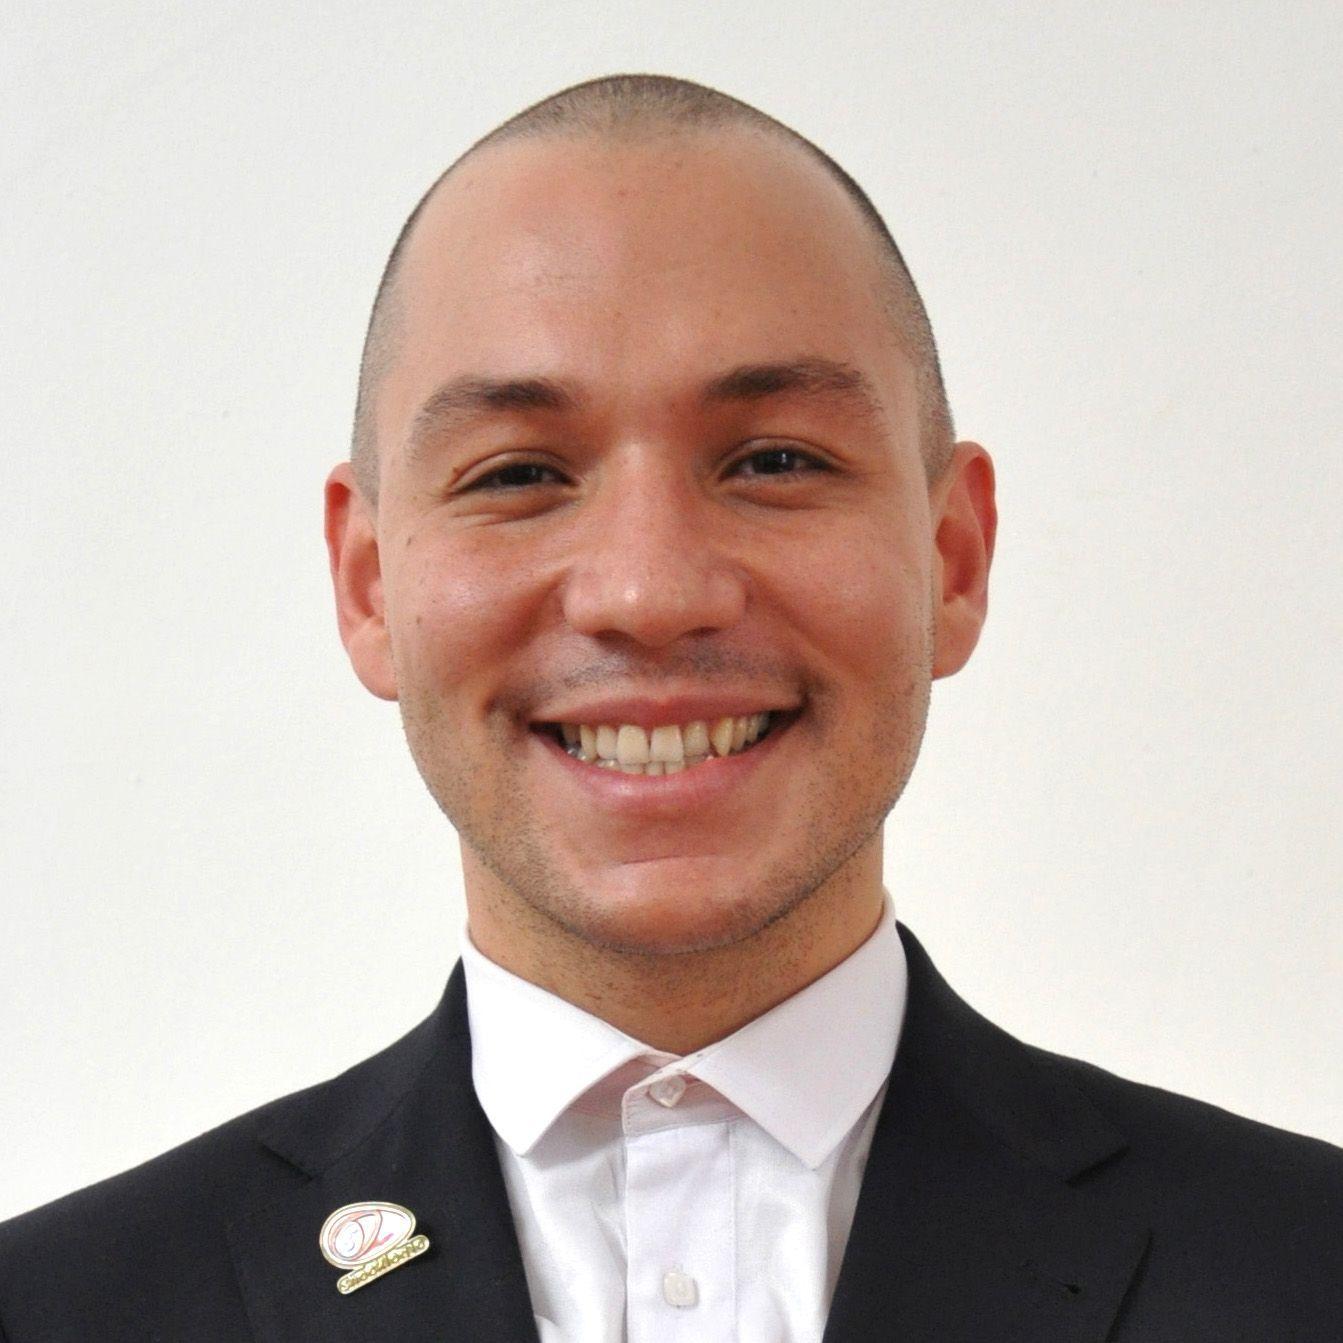 Johnny D. Martinez